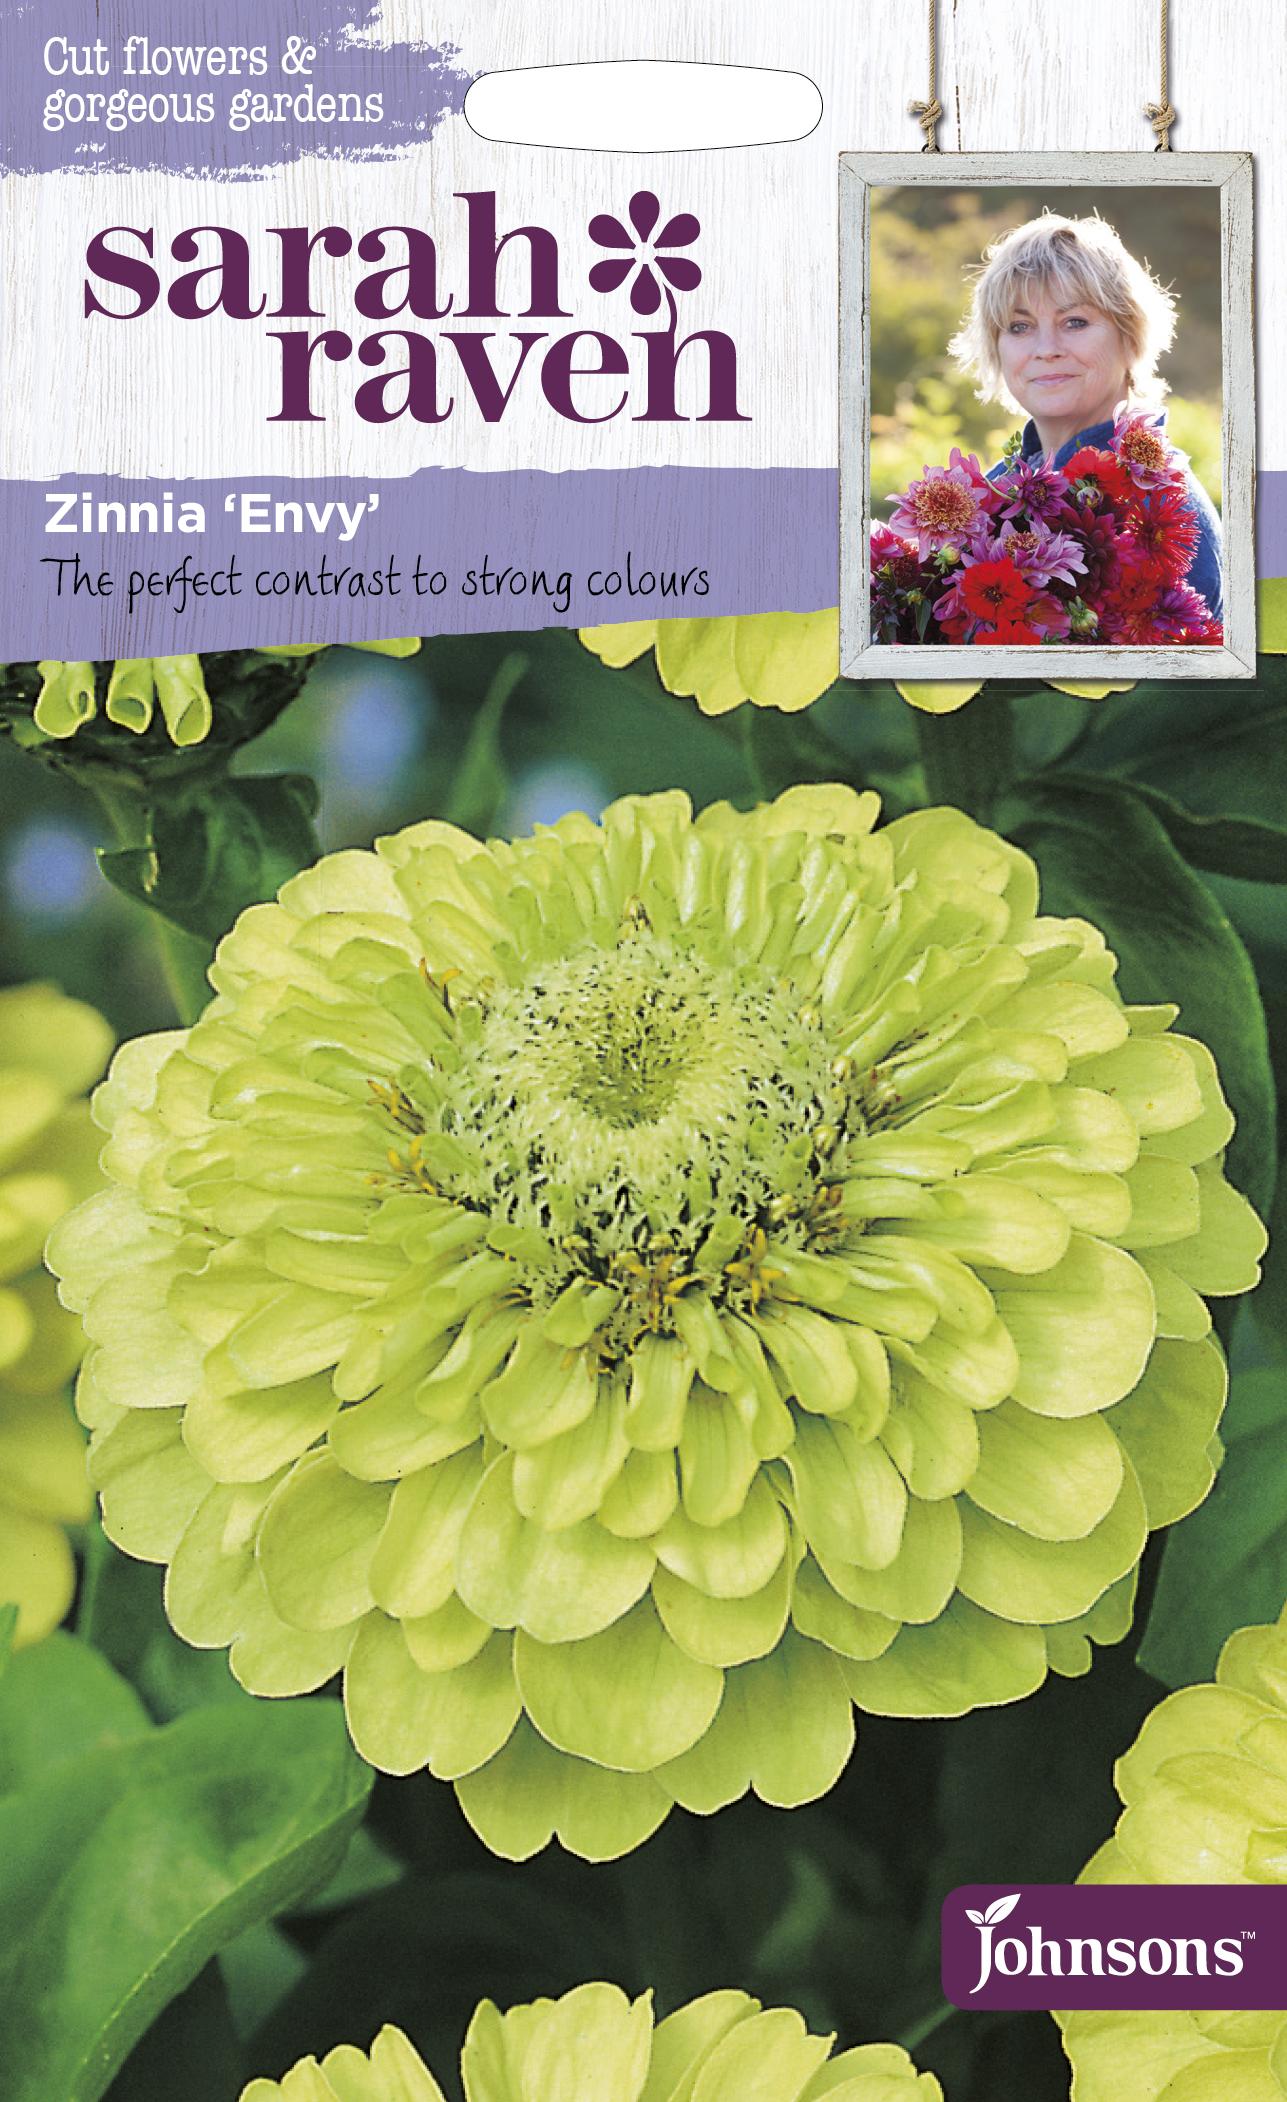 Zinnia 'Envy